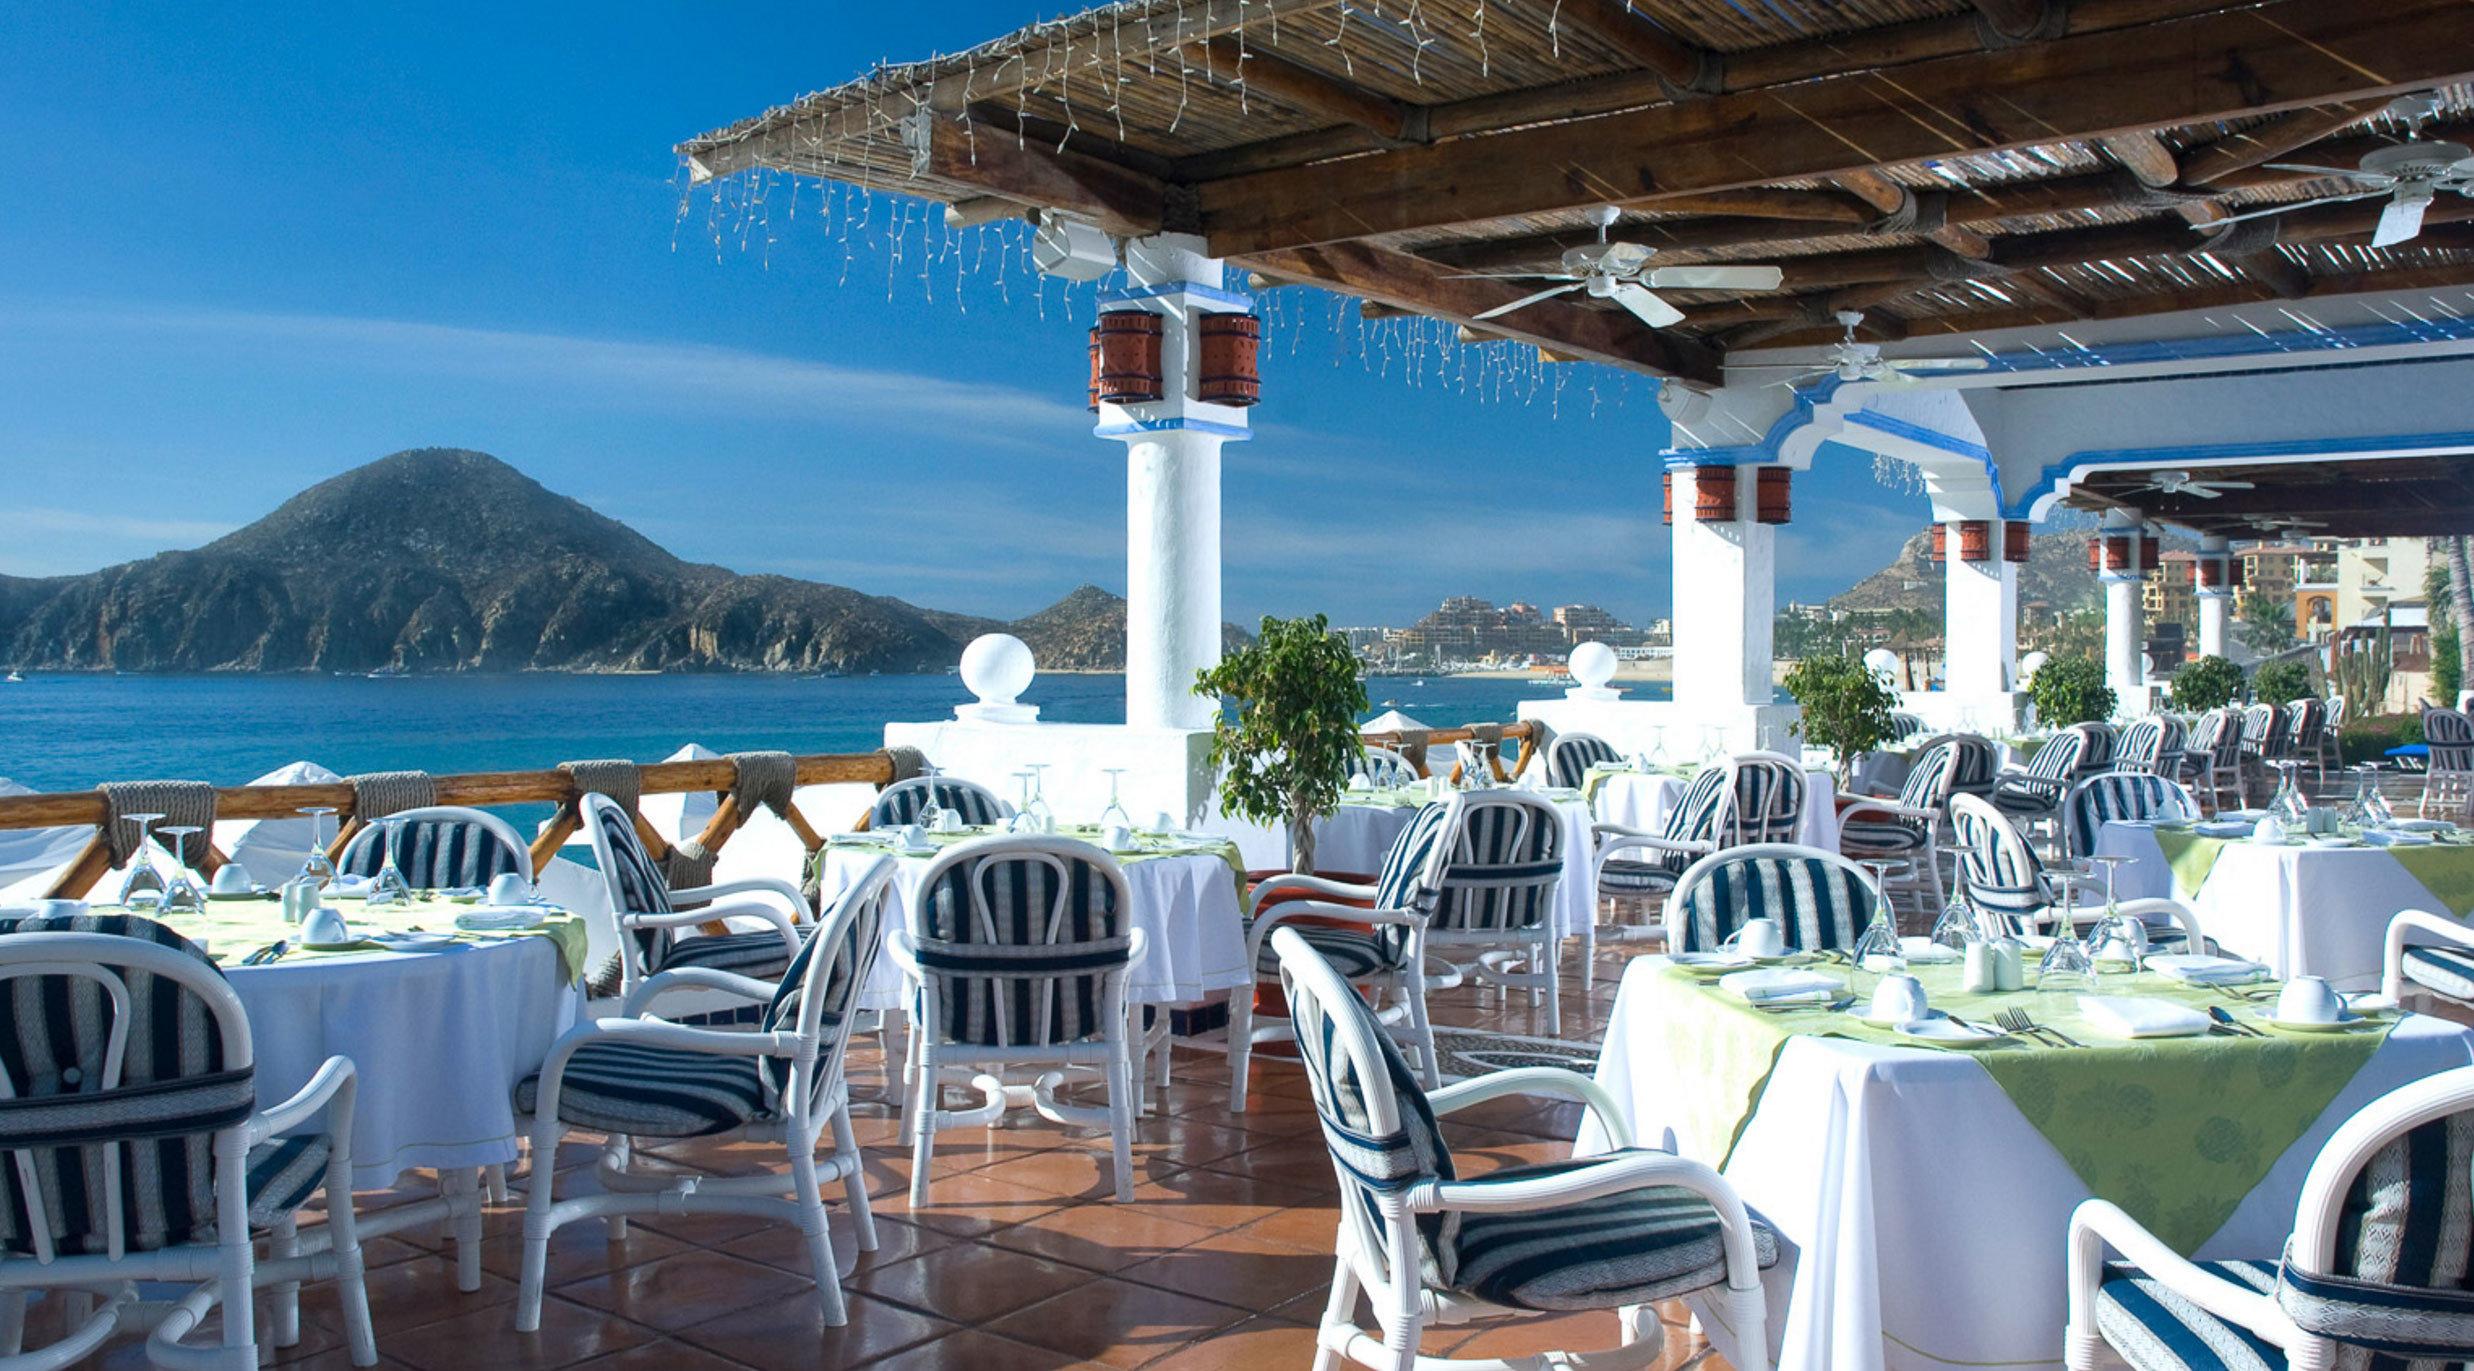 chair restaurant Resort Dining Deck set